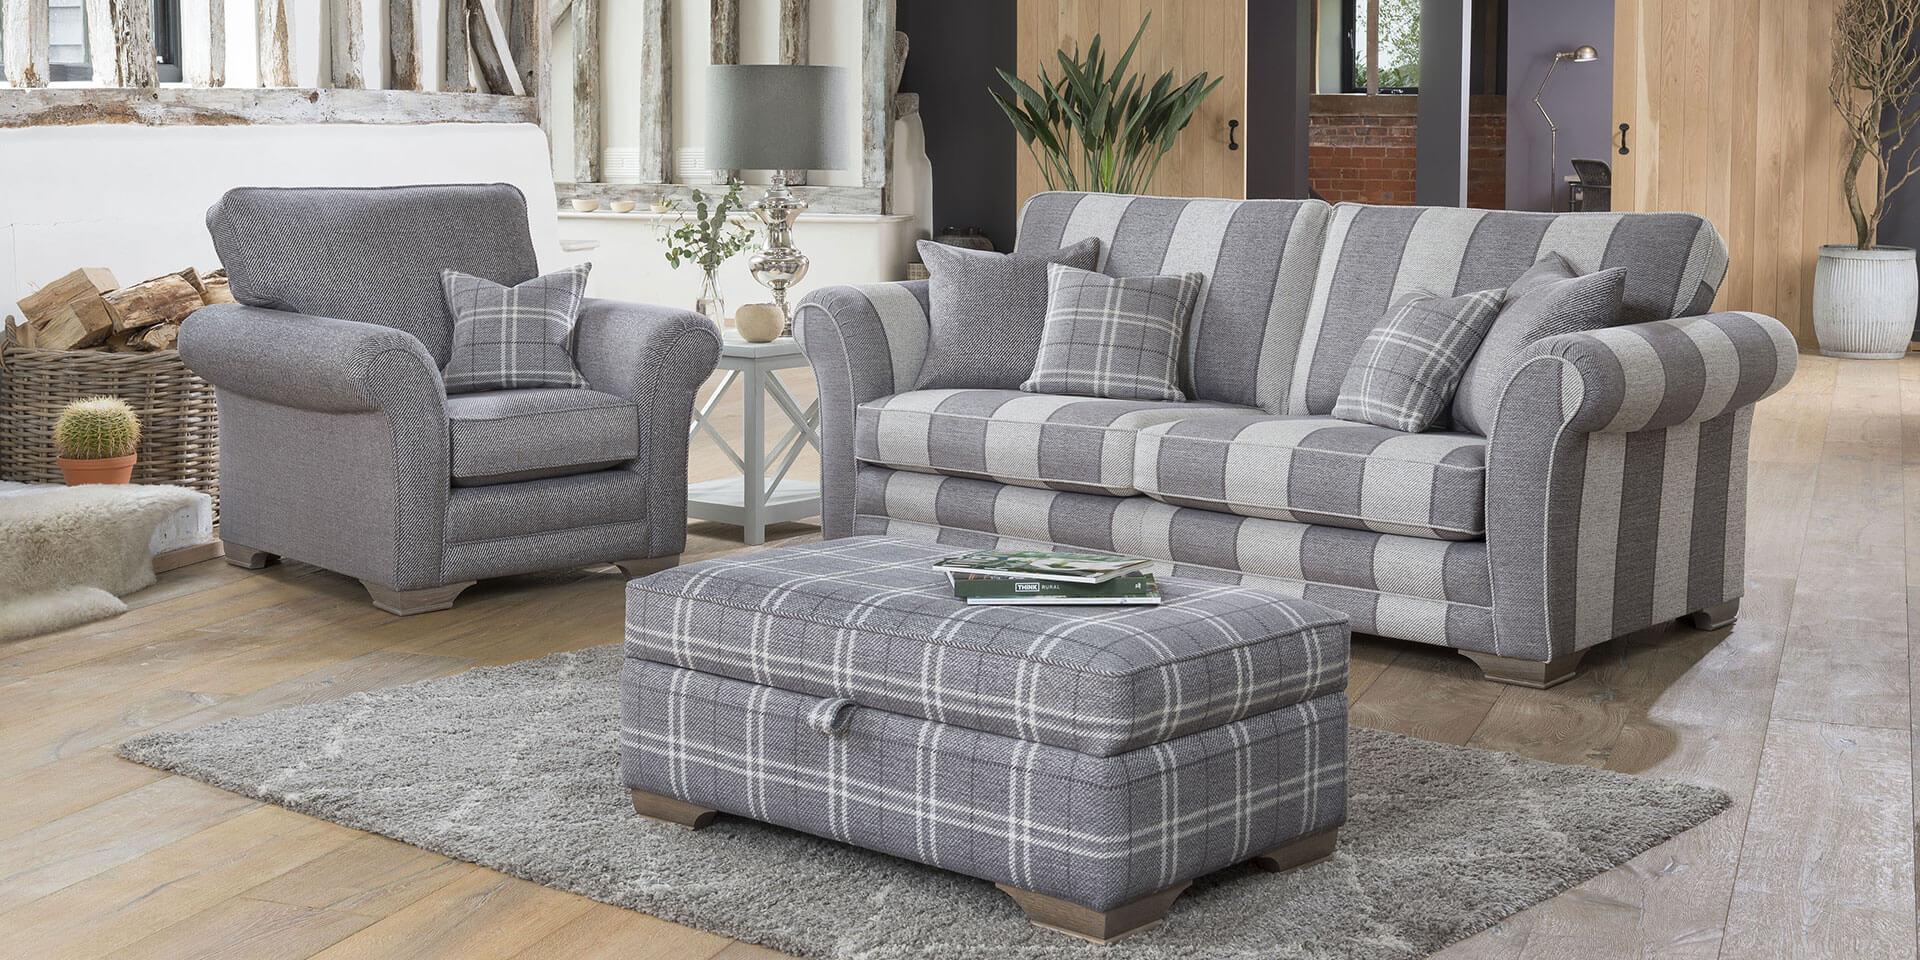 furniture manufacturers uk british sofa manufacturers brokeasshome com